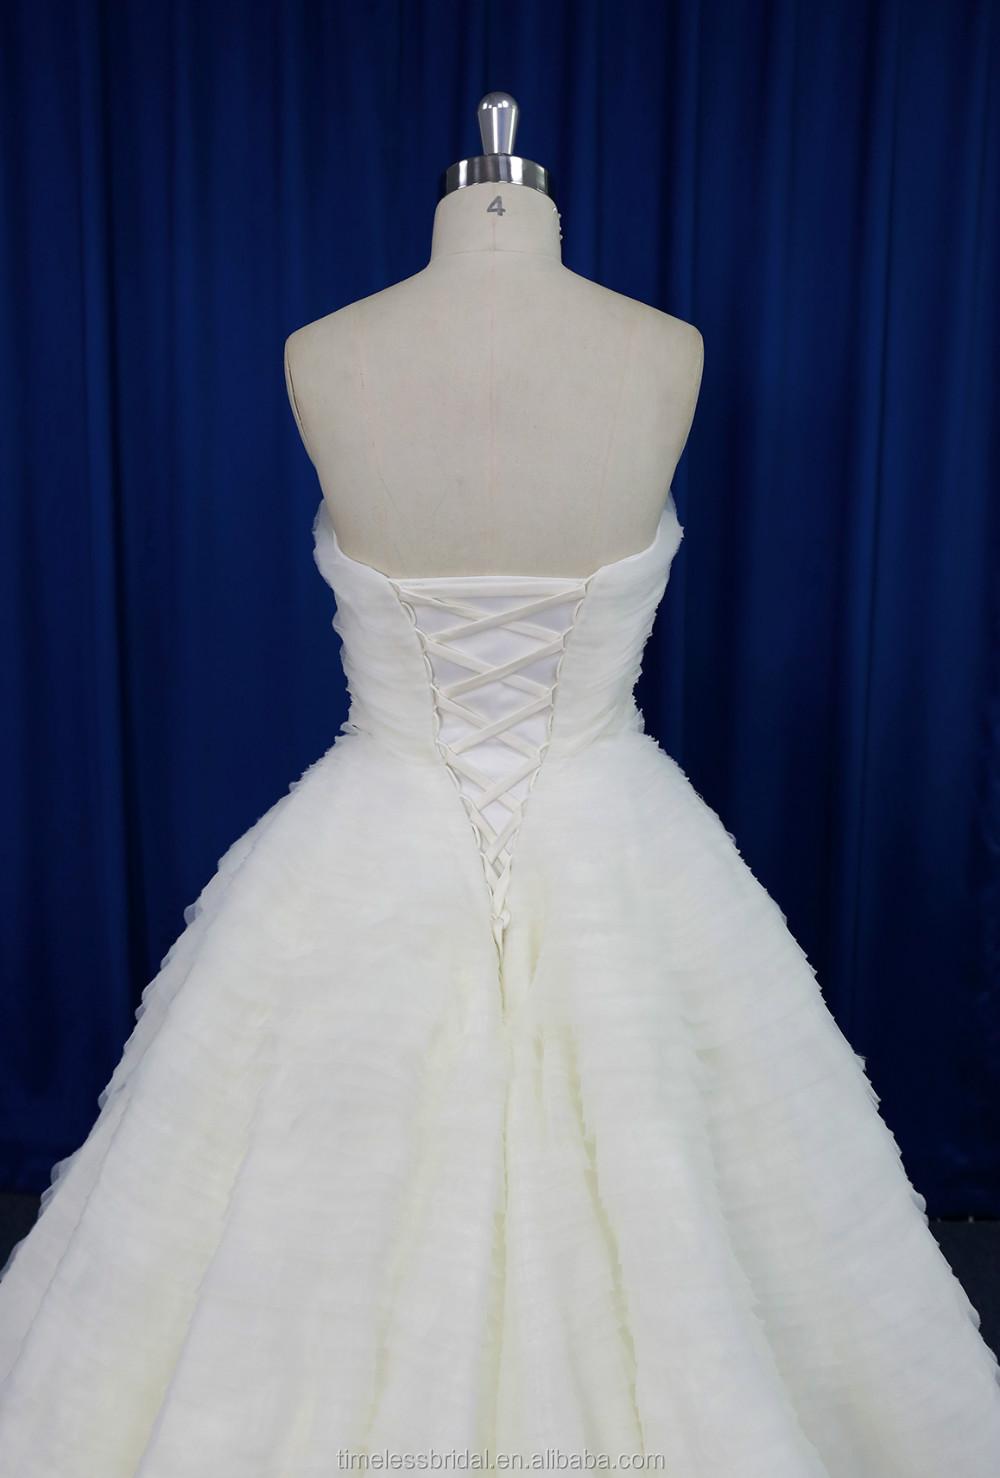 Fancy Boob Tube Top Frilled Organza Layers Ball Gown Wedding Dress 2016 New Design Buy Wedding Dress Wedding Dress 2016 New Design Organza Wedding